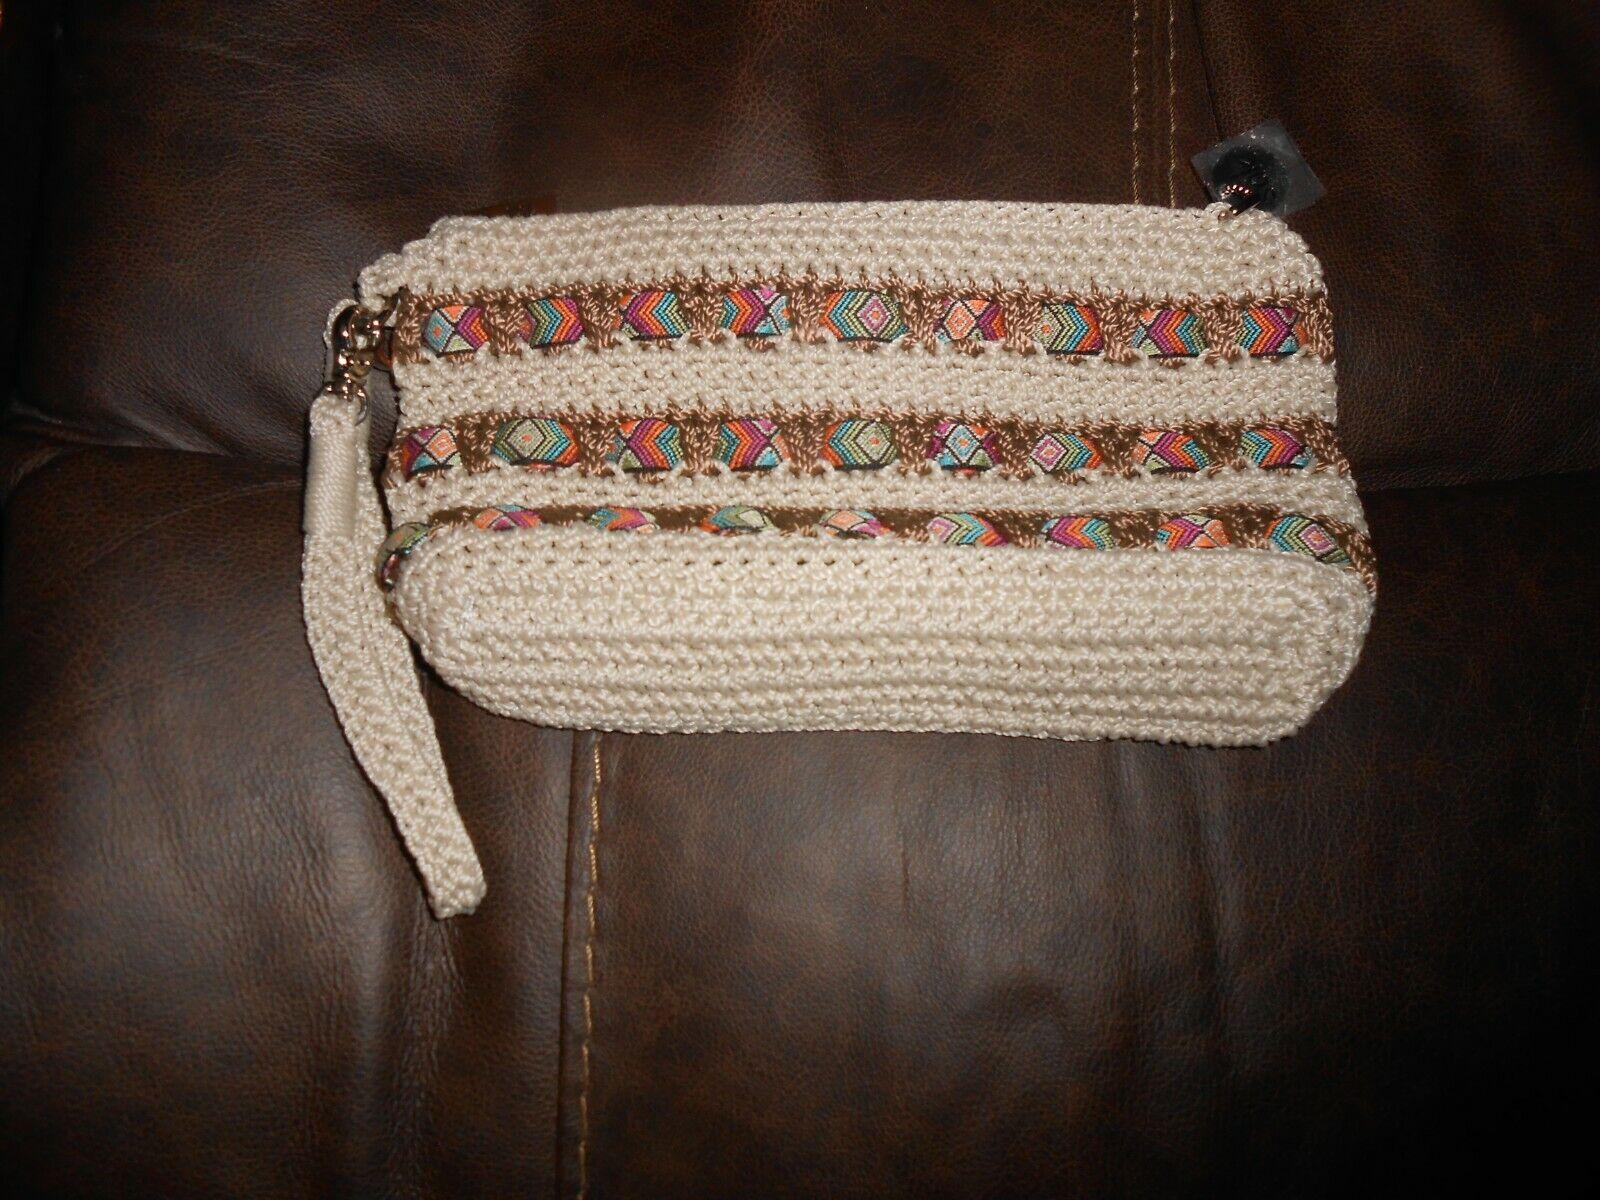 The SAK Crocheted Wristlet Multicolor